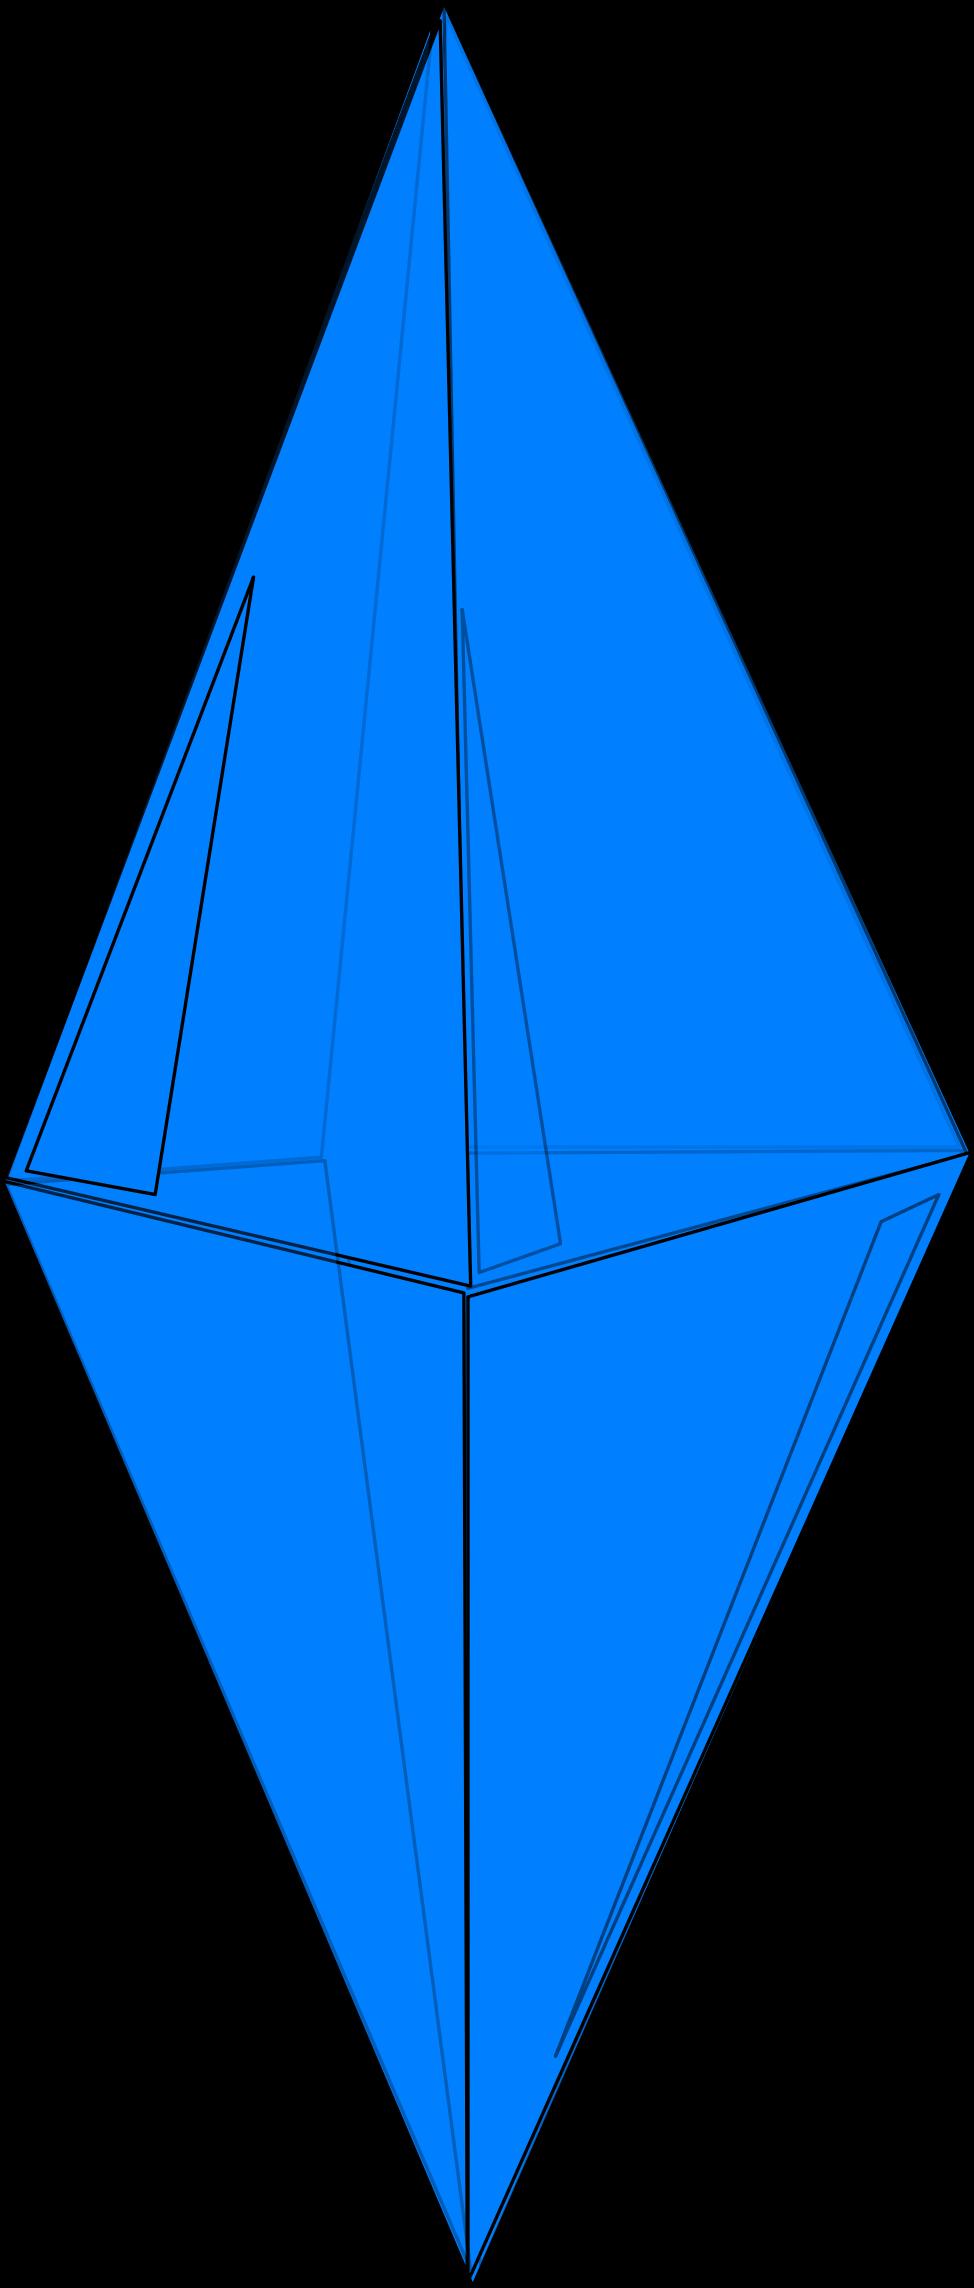 Big image png. Crystal clipart blue crystal